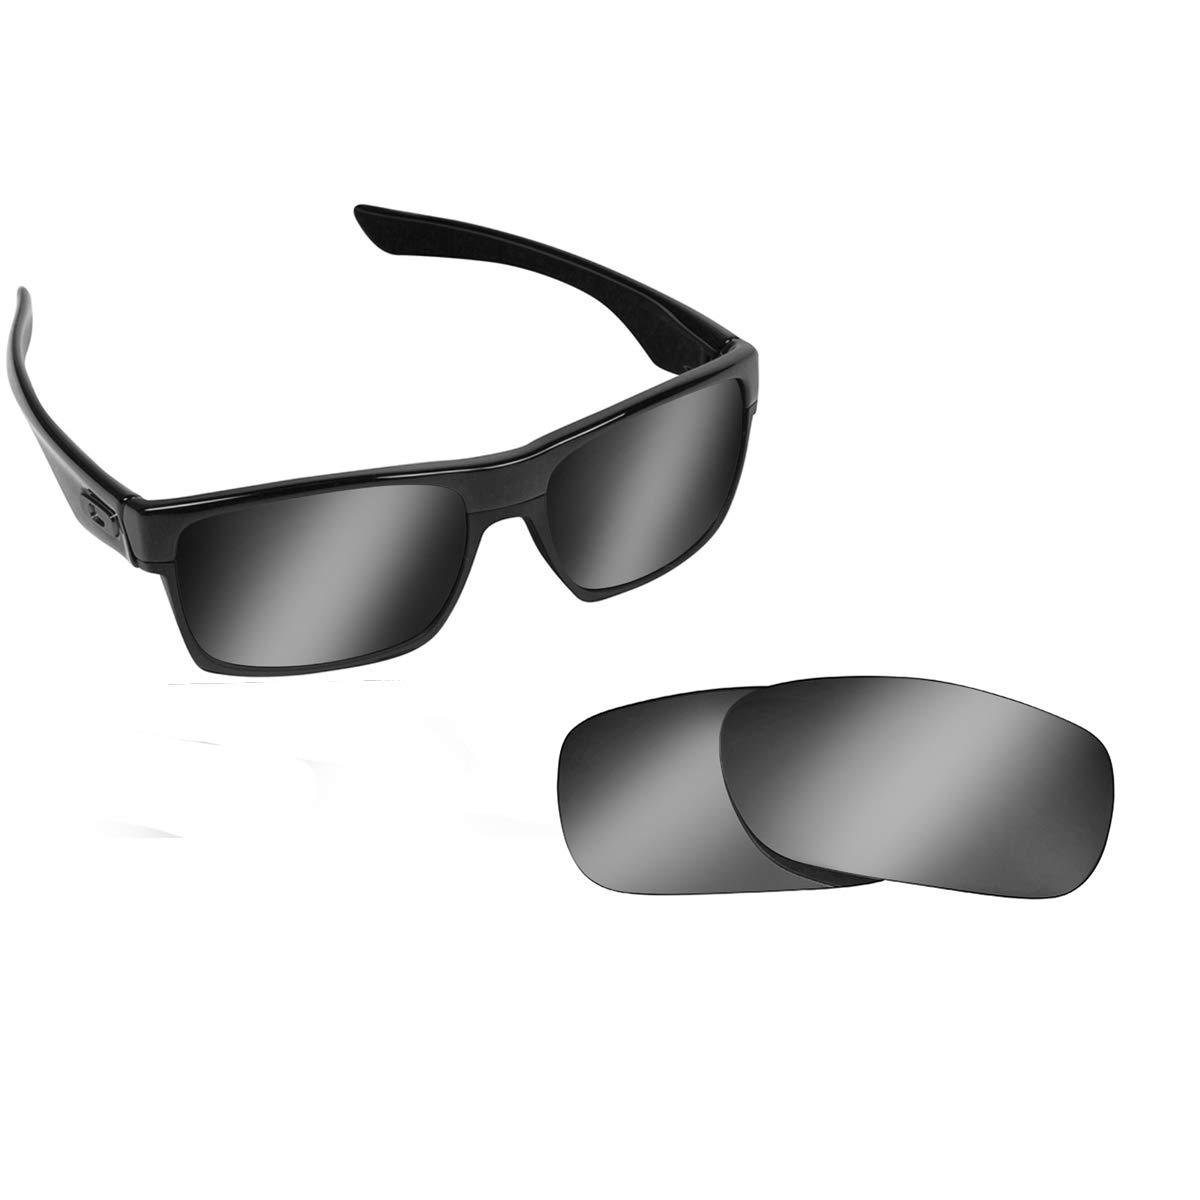 80538e24b7 TWOFACE Replacement Lenses Polarized Black Iridium by SEEK fits OAKLEY at  Amazon Men s Clothing store